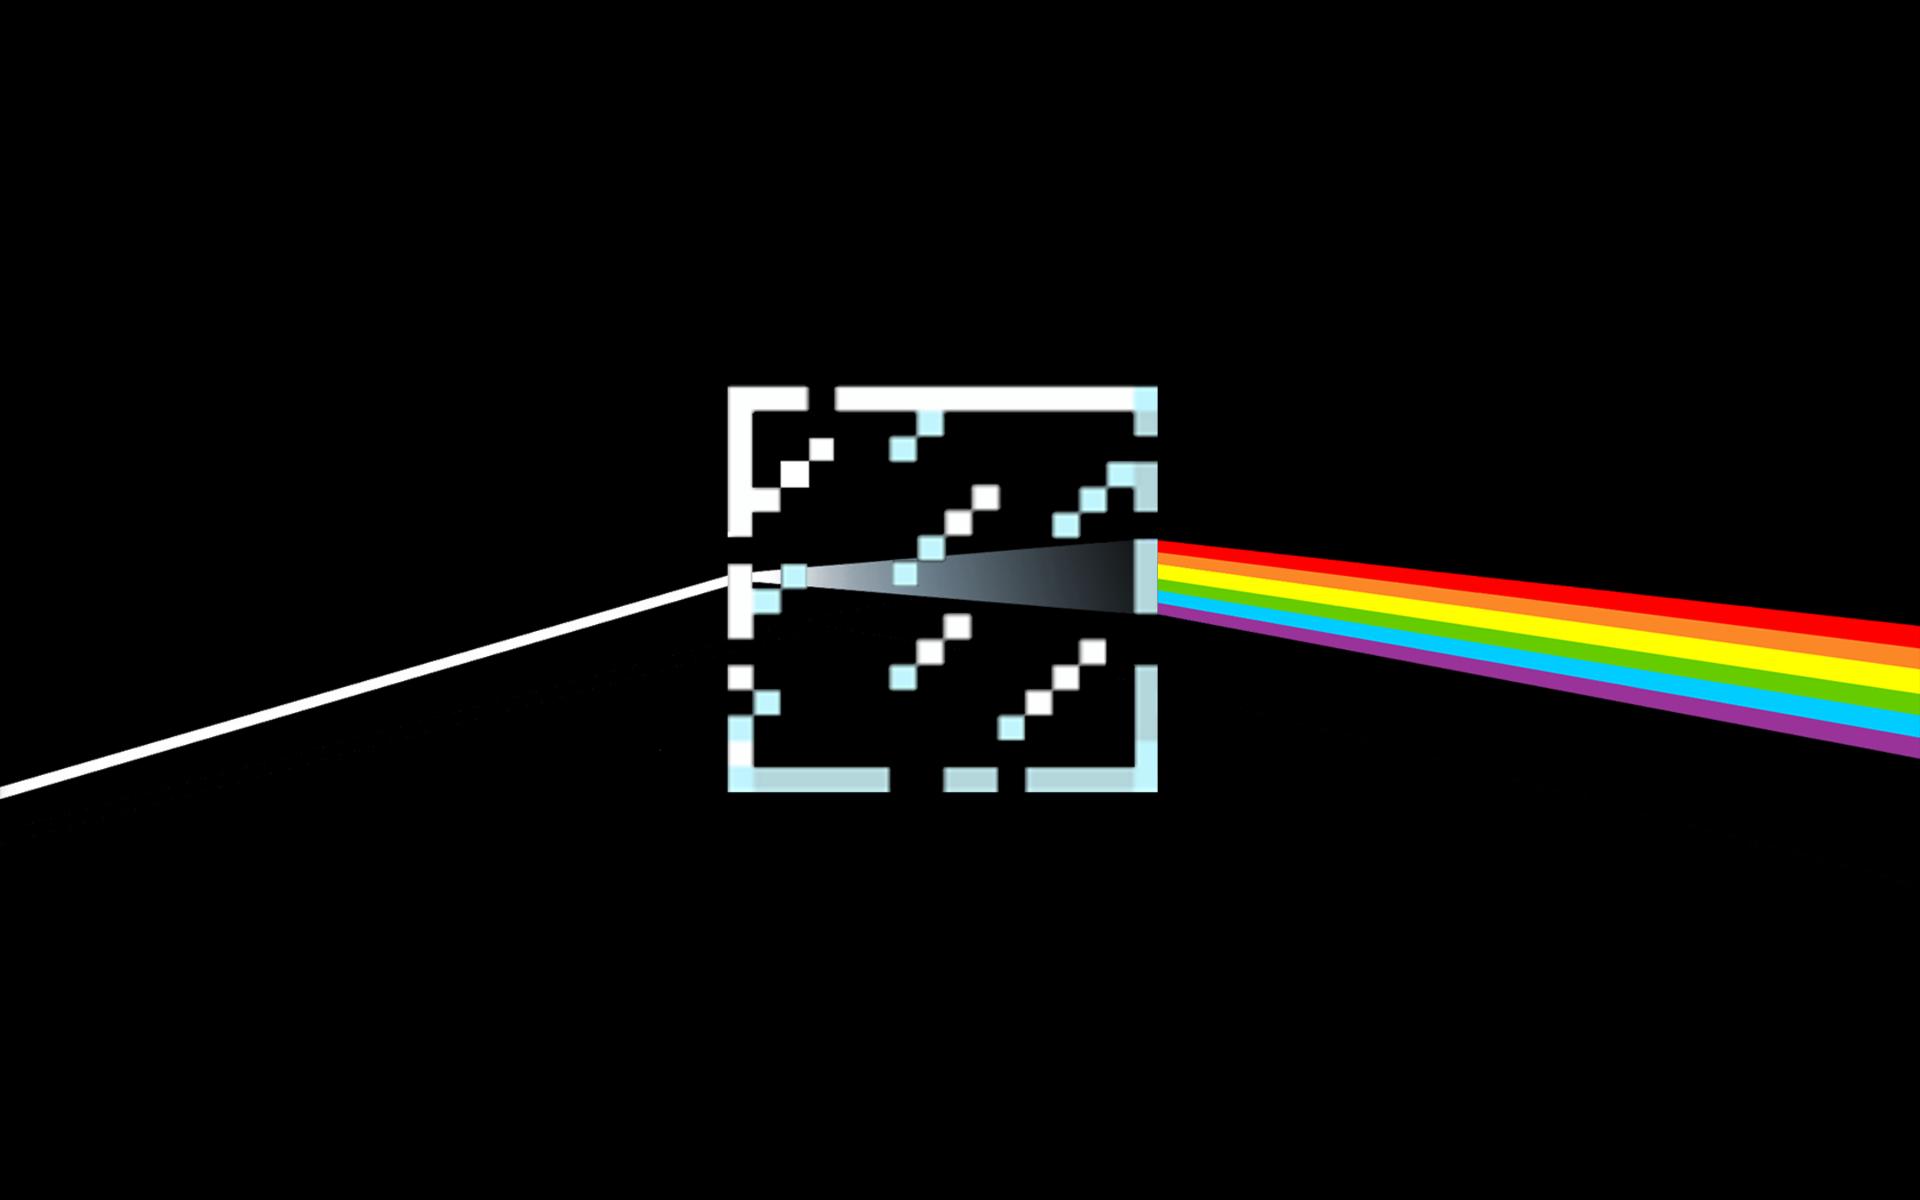 Pink Floyd Wallpaper 1920x1200 Pink Floyd Minecraft 1920x1200